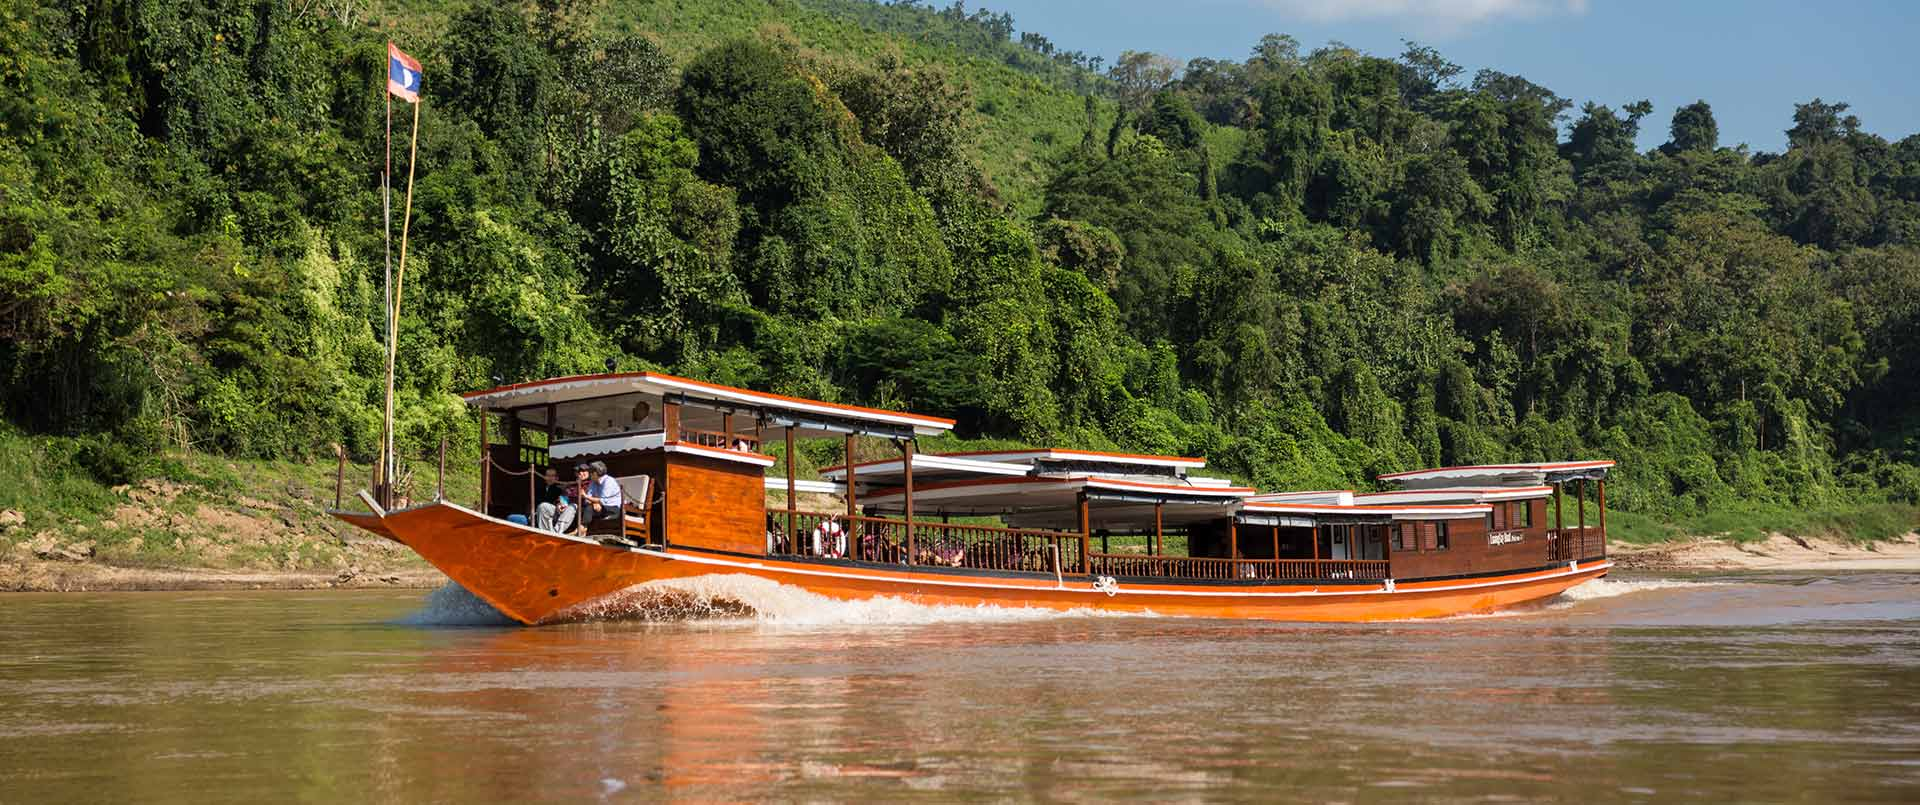 Luang Say River Cruise